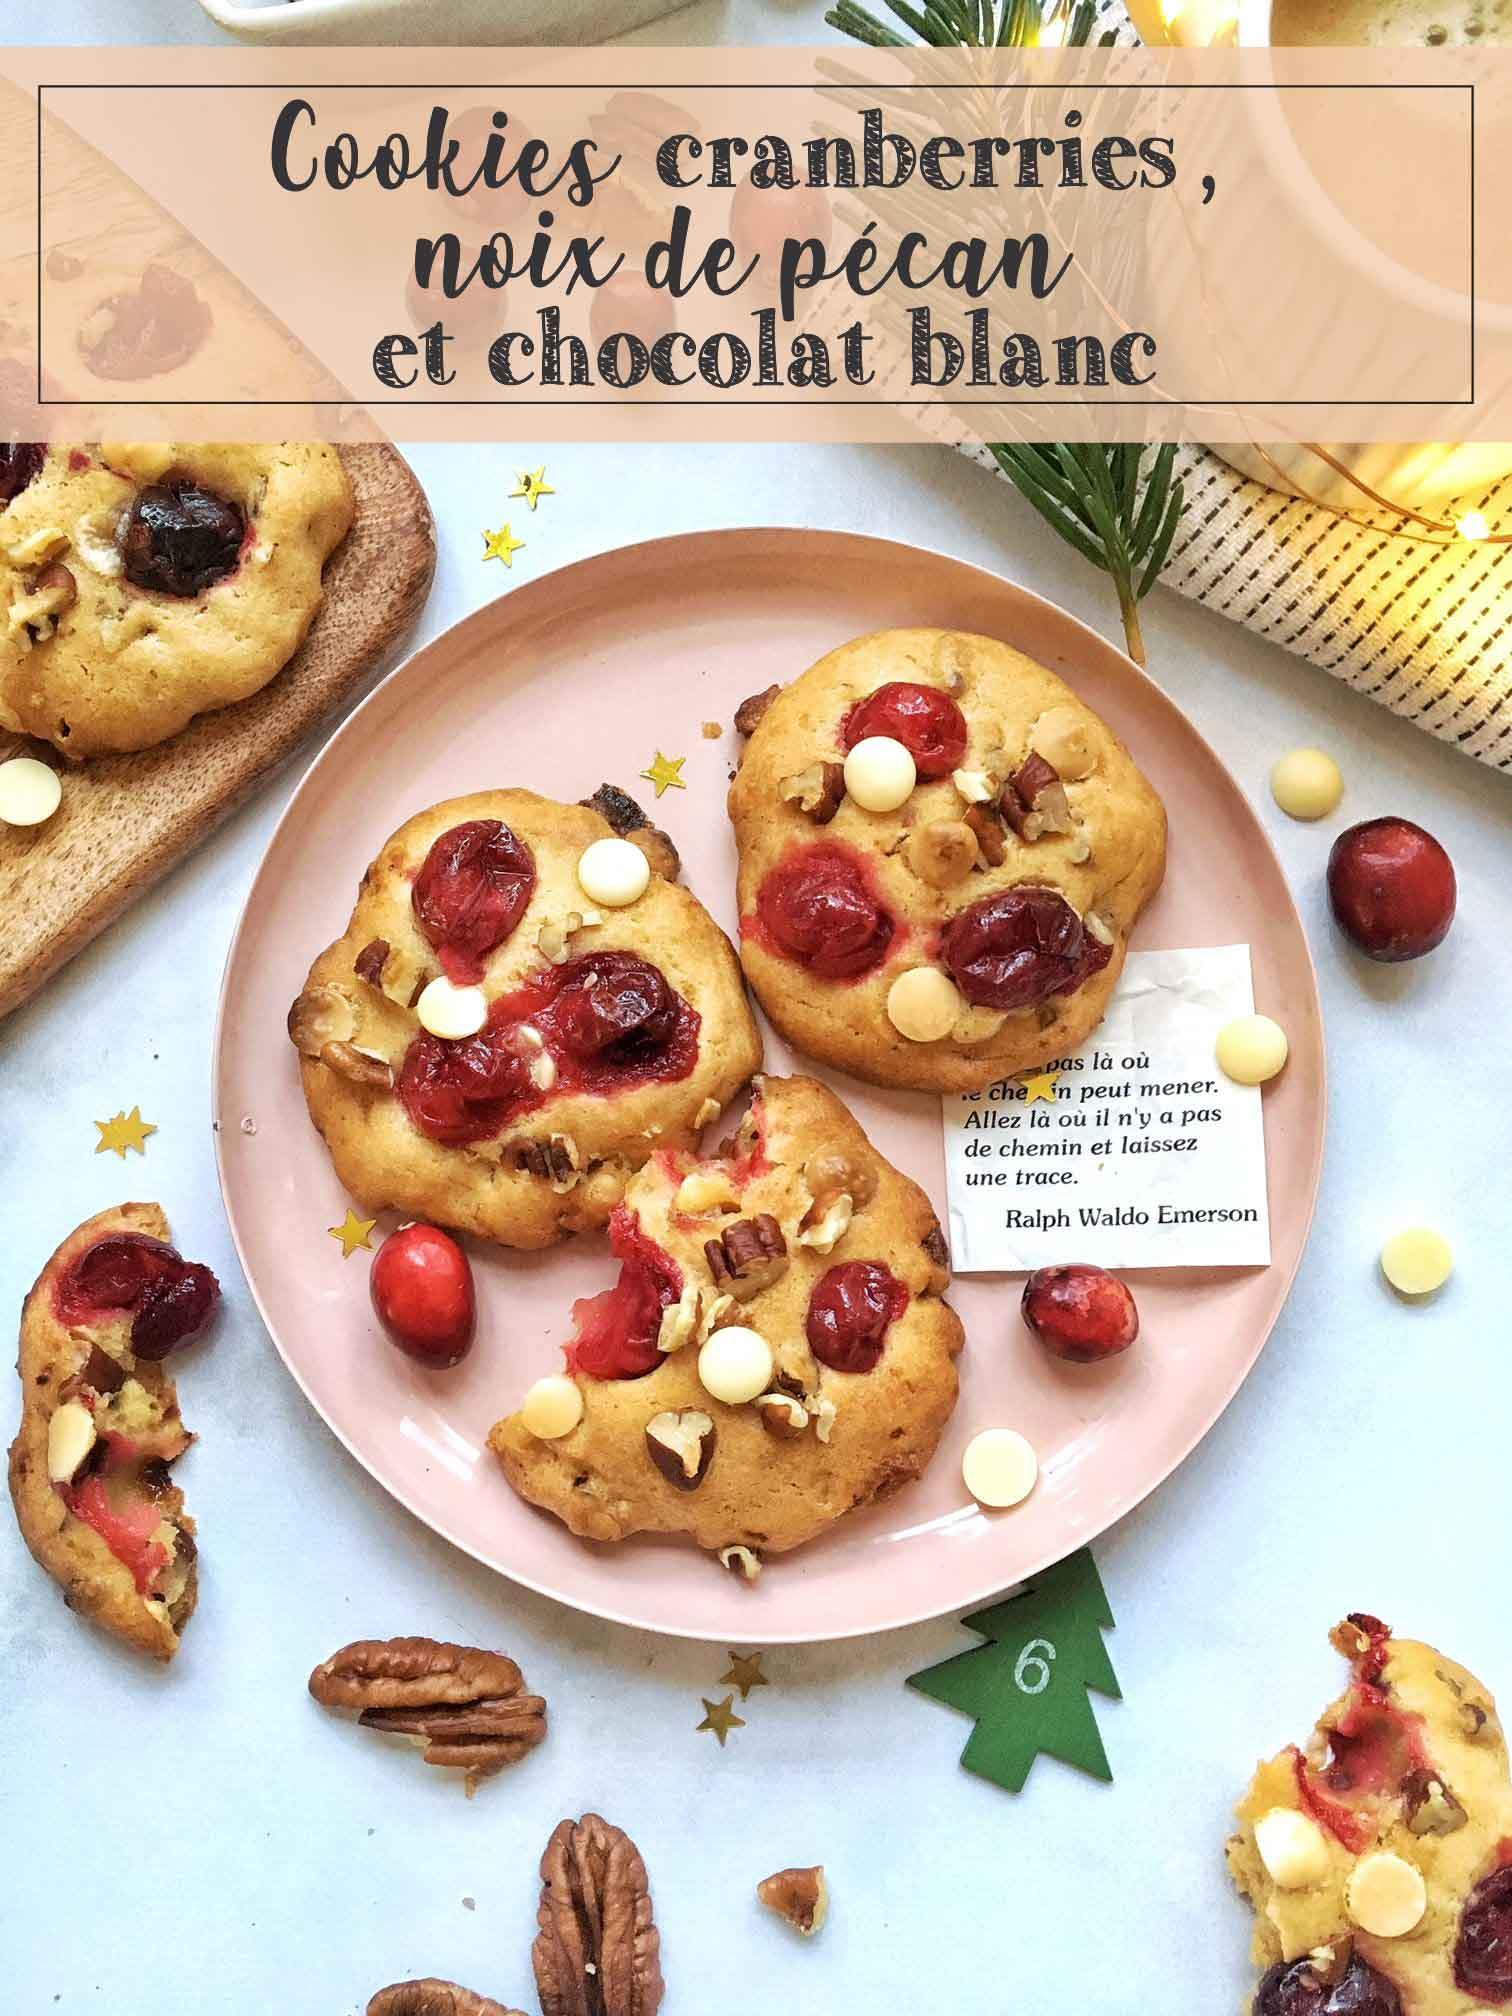 cookies-cranberries-noix-de-pecan-chocolat-blanc-the-good-and-the-food-01